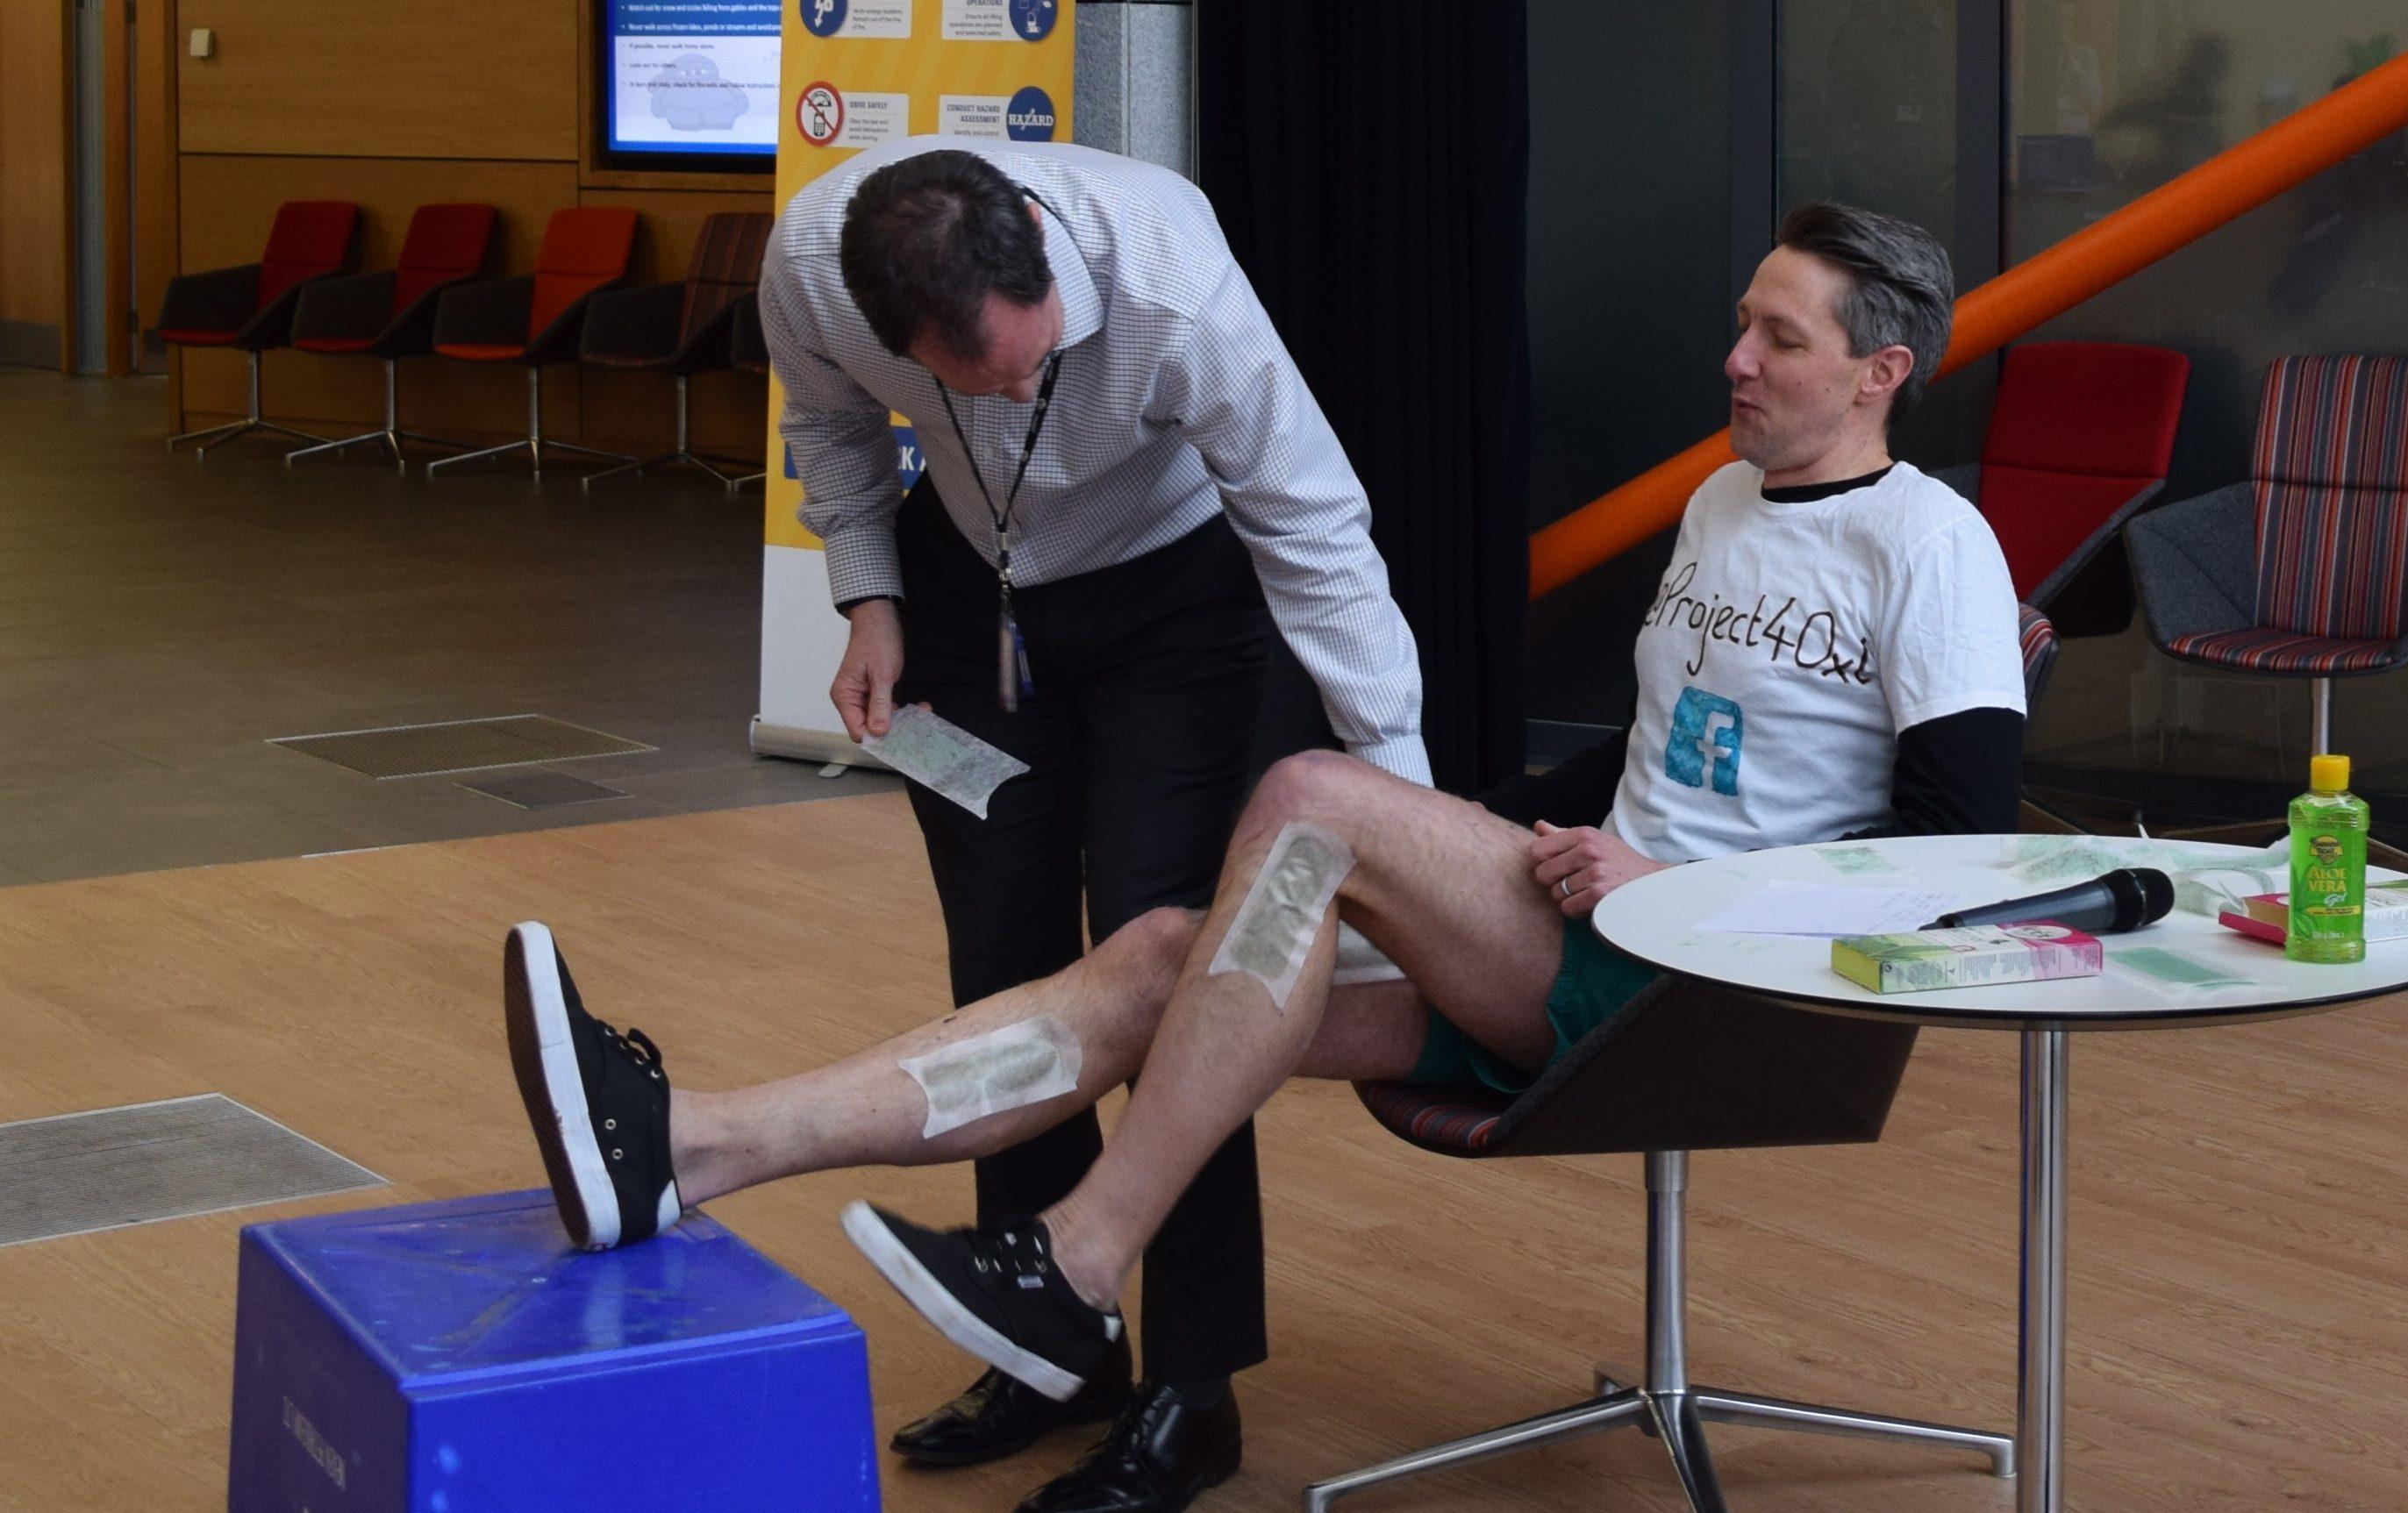 Robbie having his legs waxed.